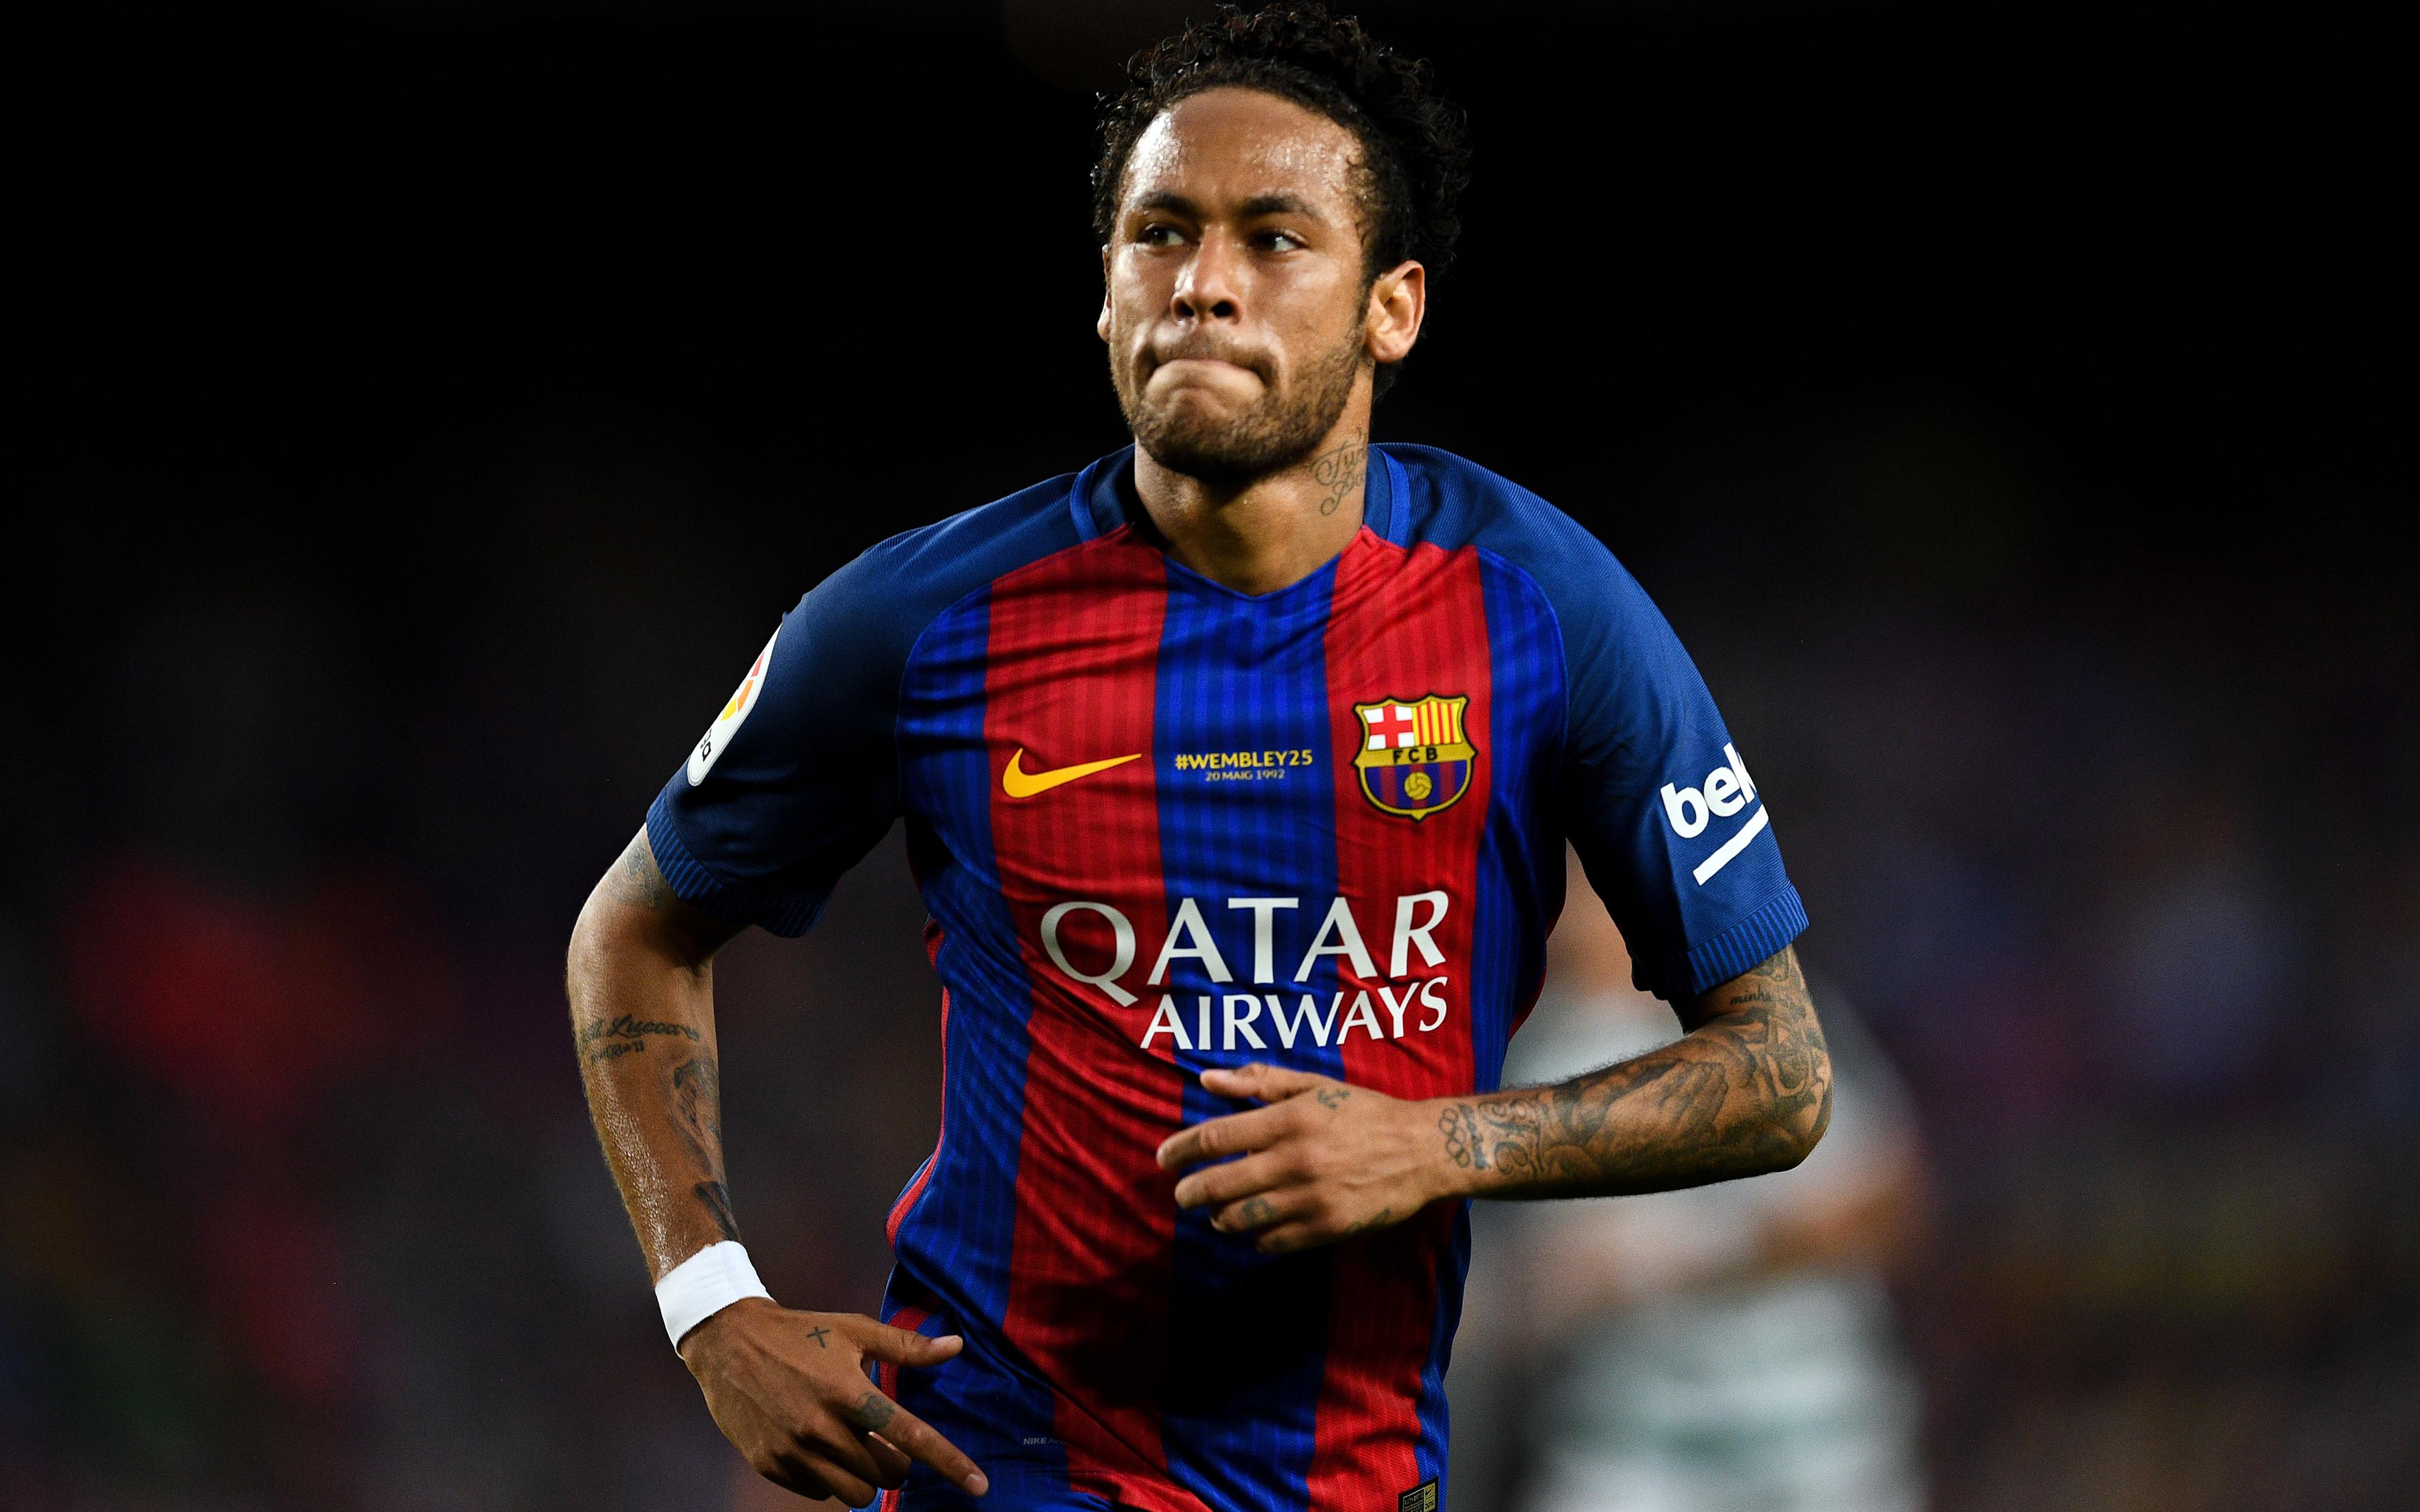 4k, Neymar, 2017, Barca, Neymar Jr, Fc Barcelona, Football ...